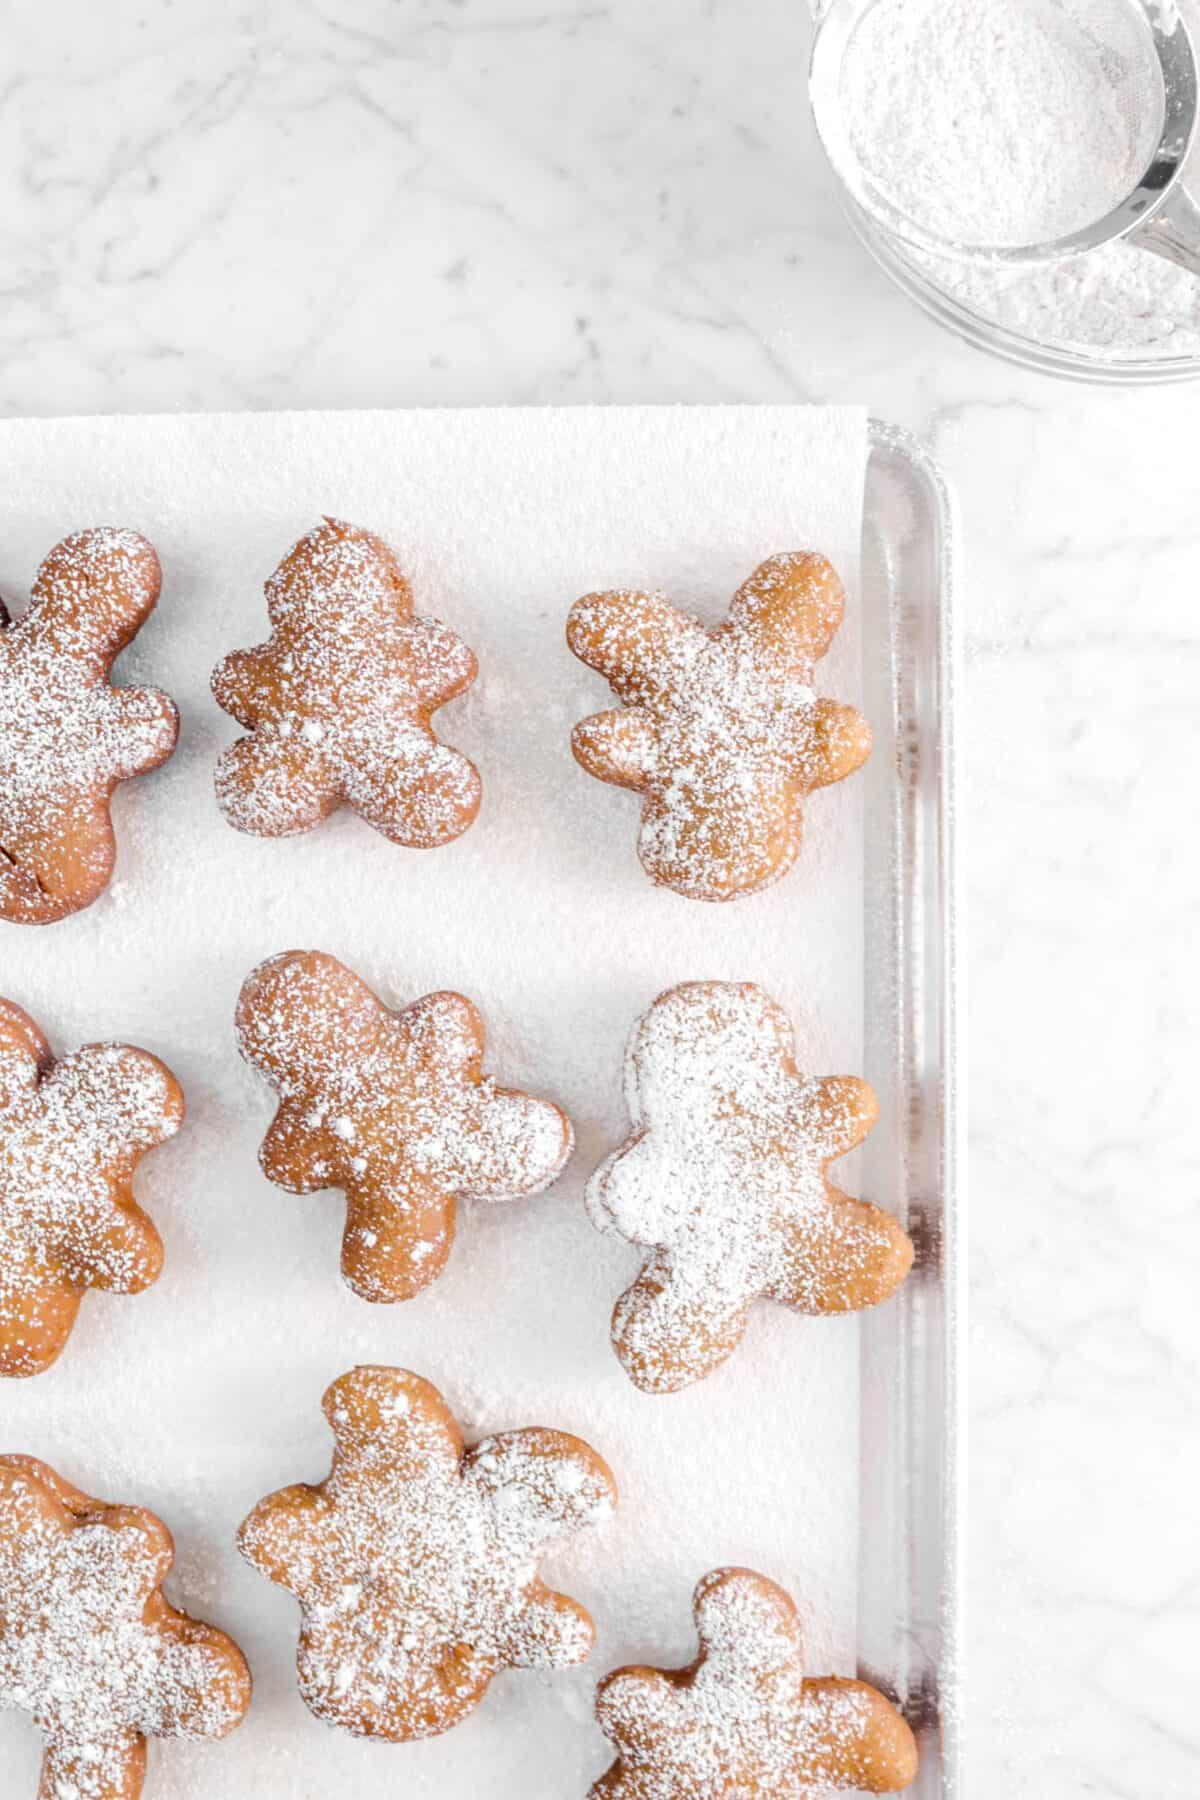 nine beignets sprinkled with powdered sugar